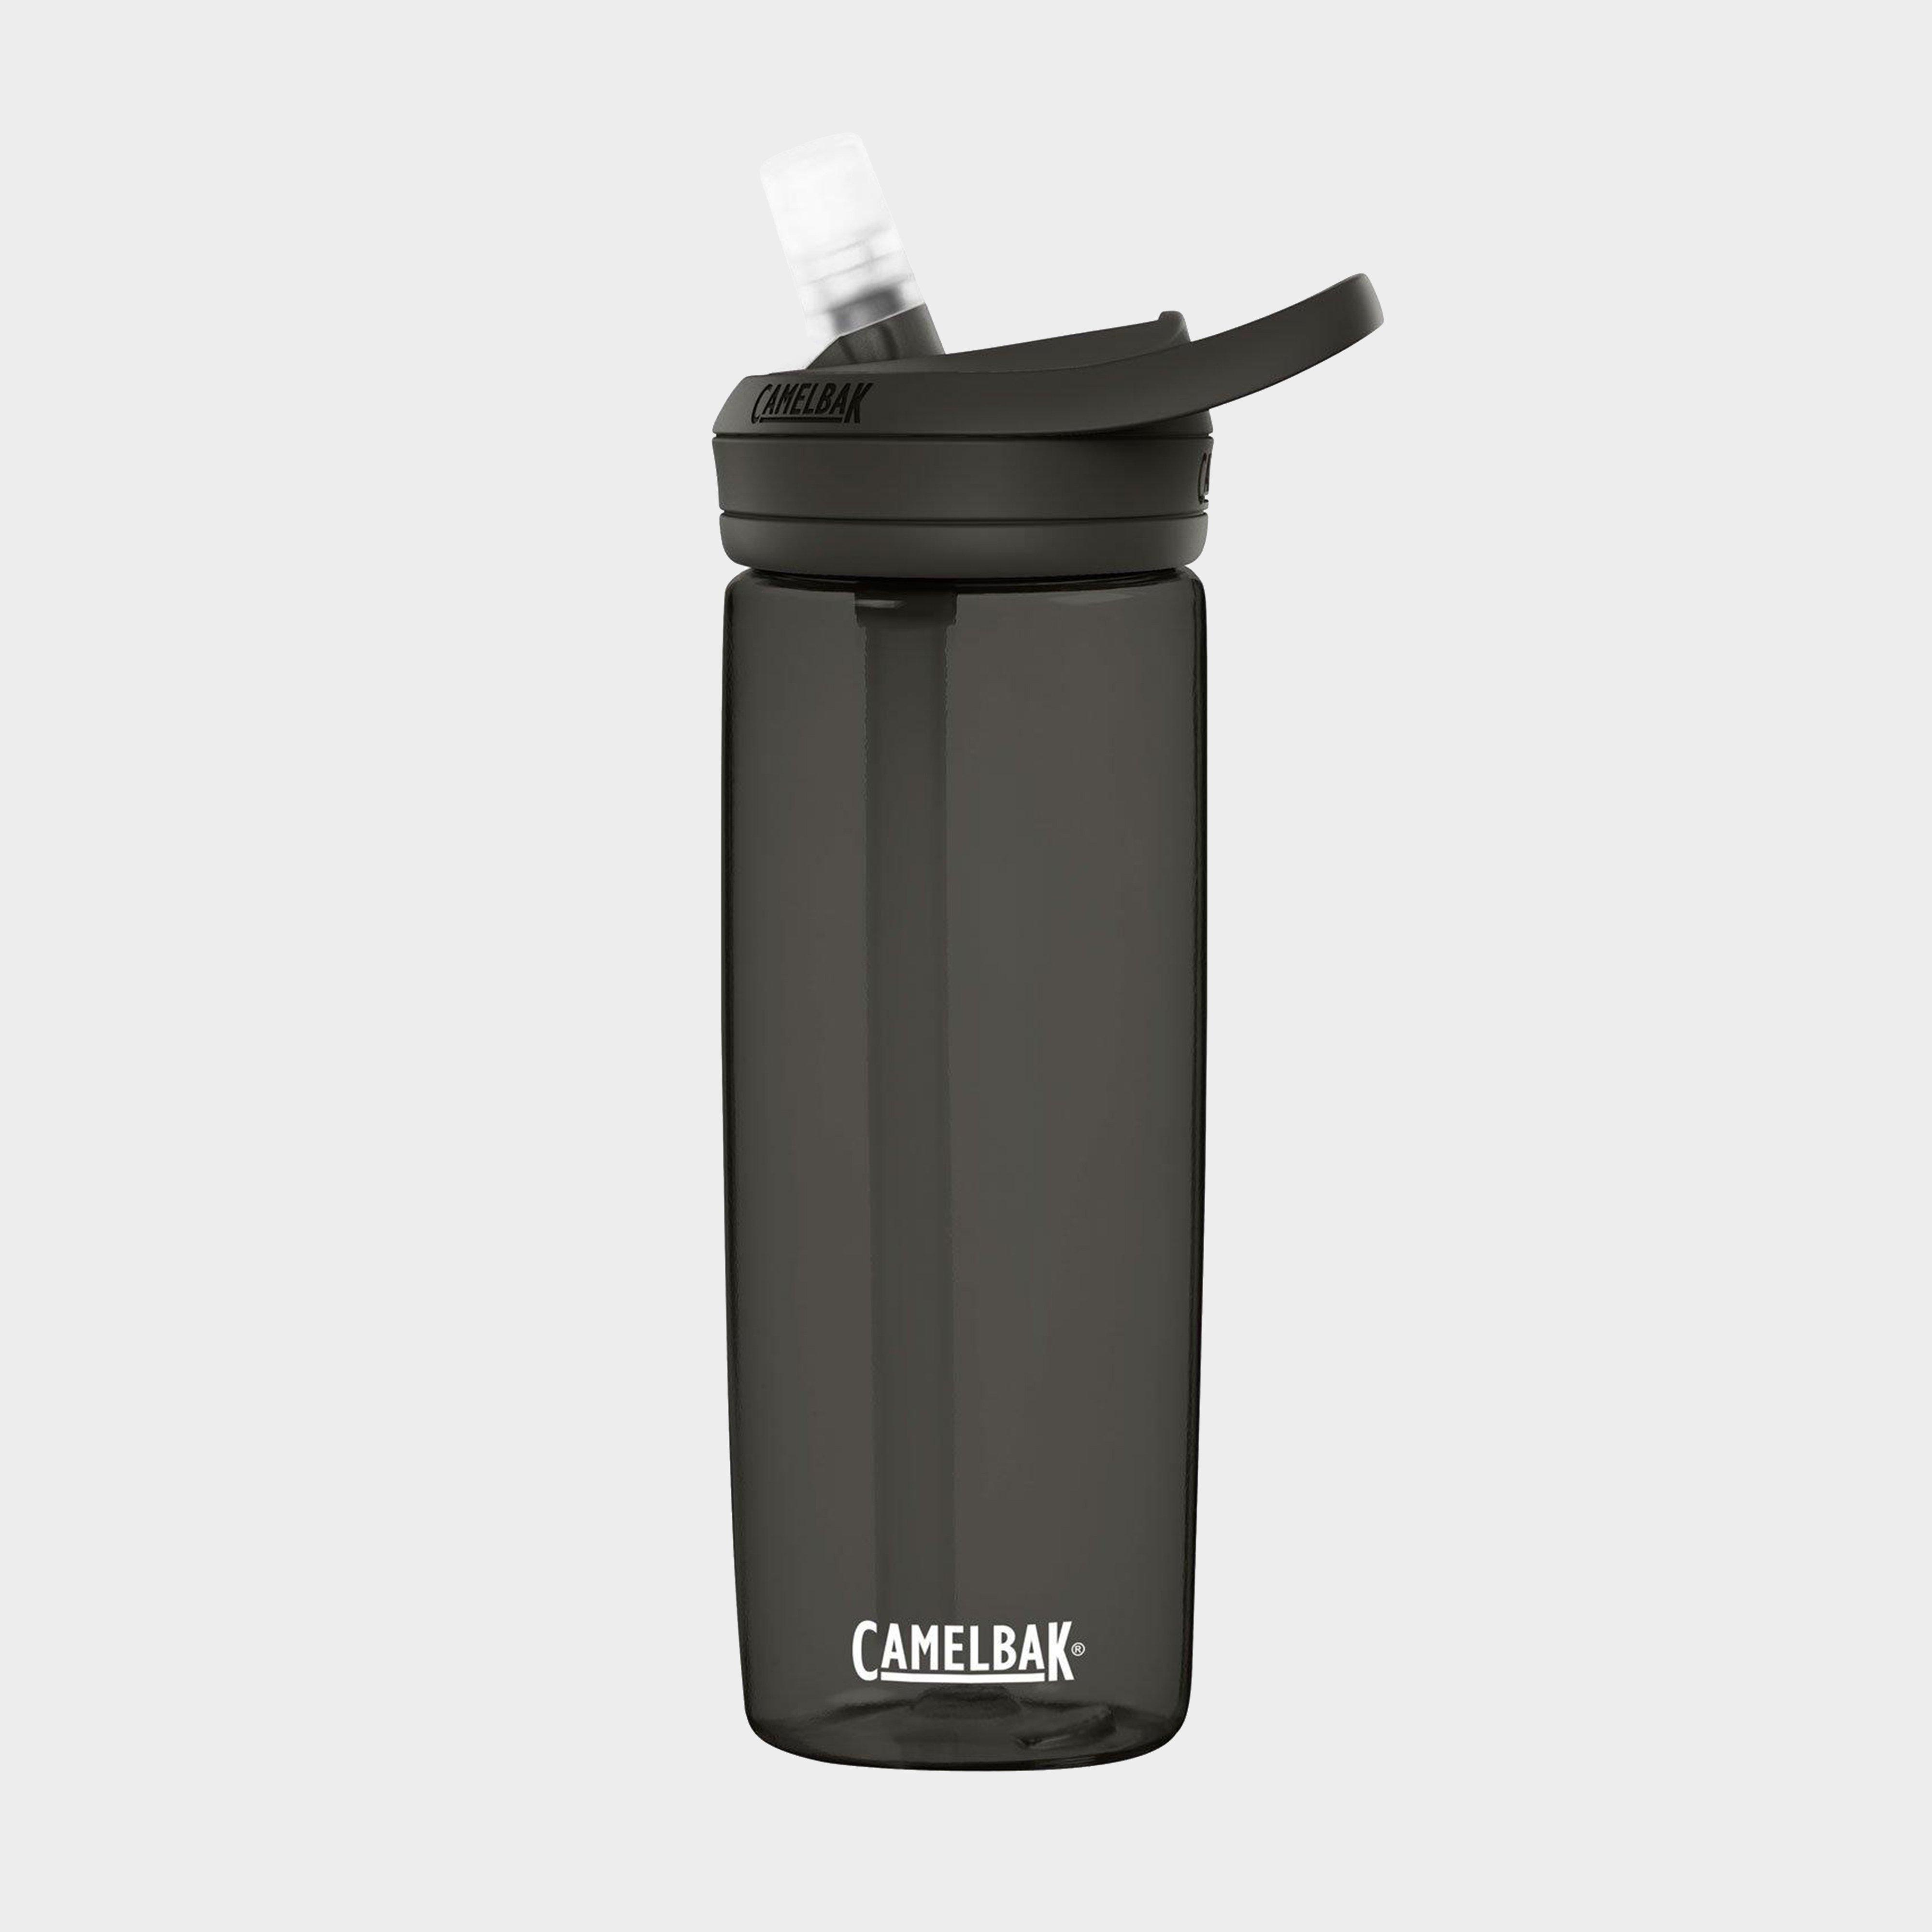 Camelbak eddy+ .6L Bottle, Black/0.6L